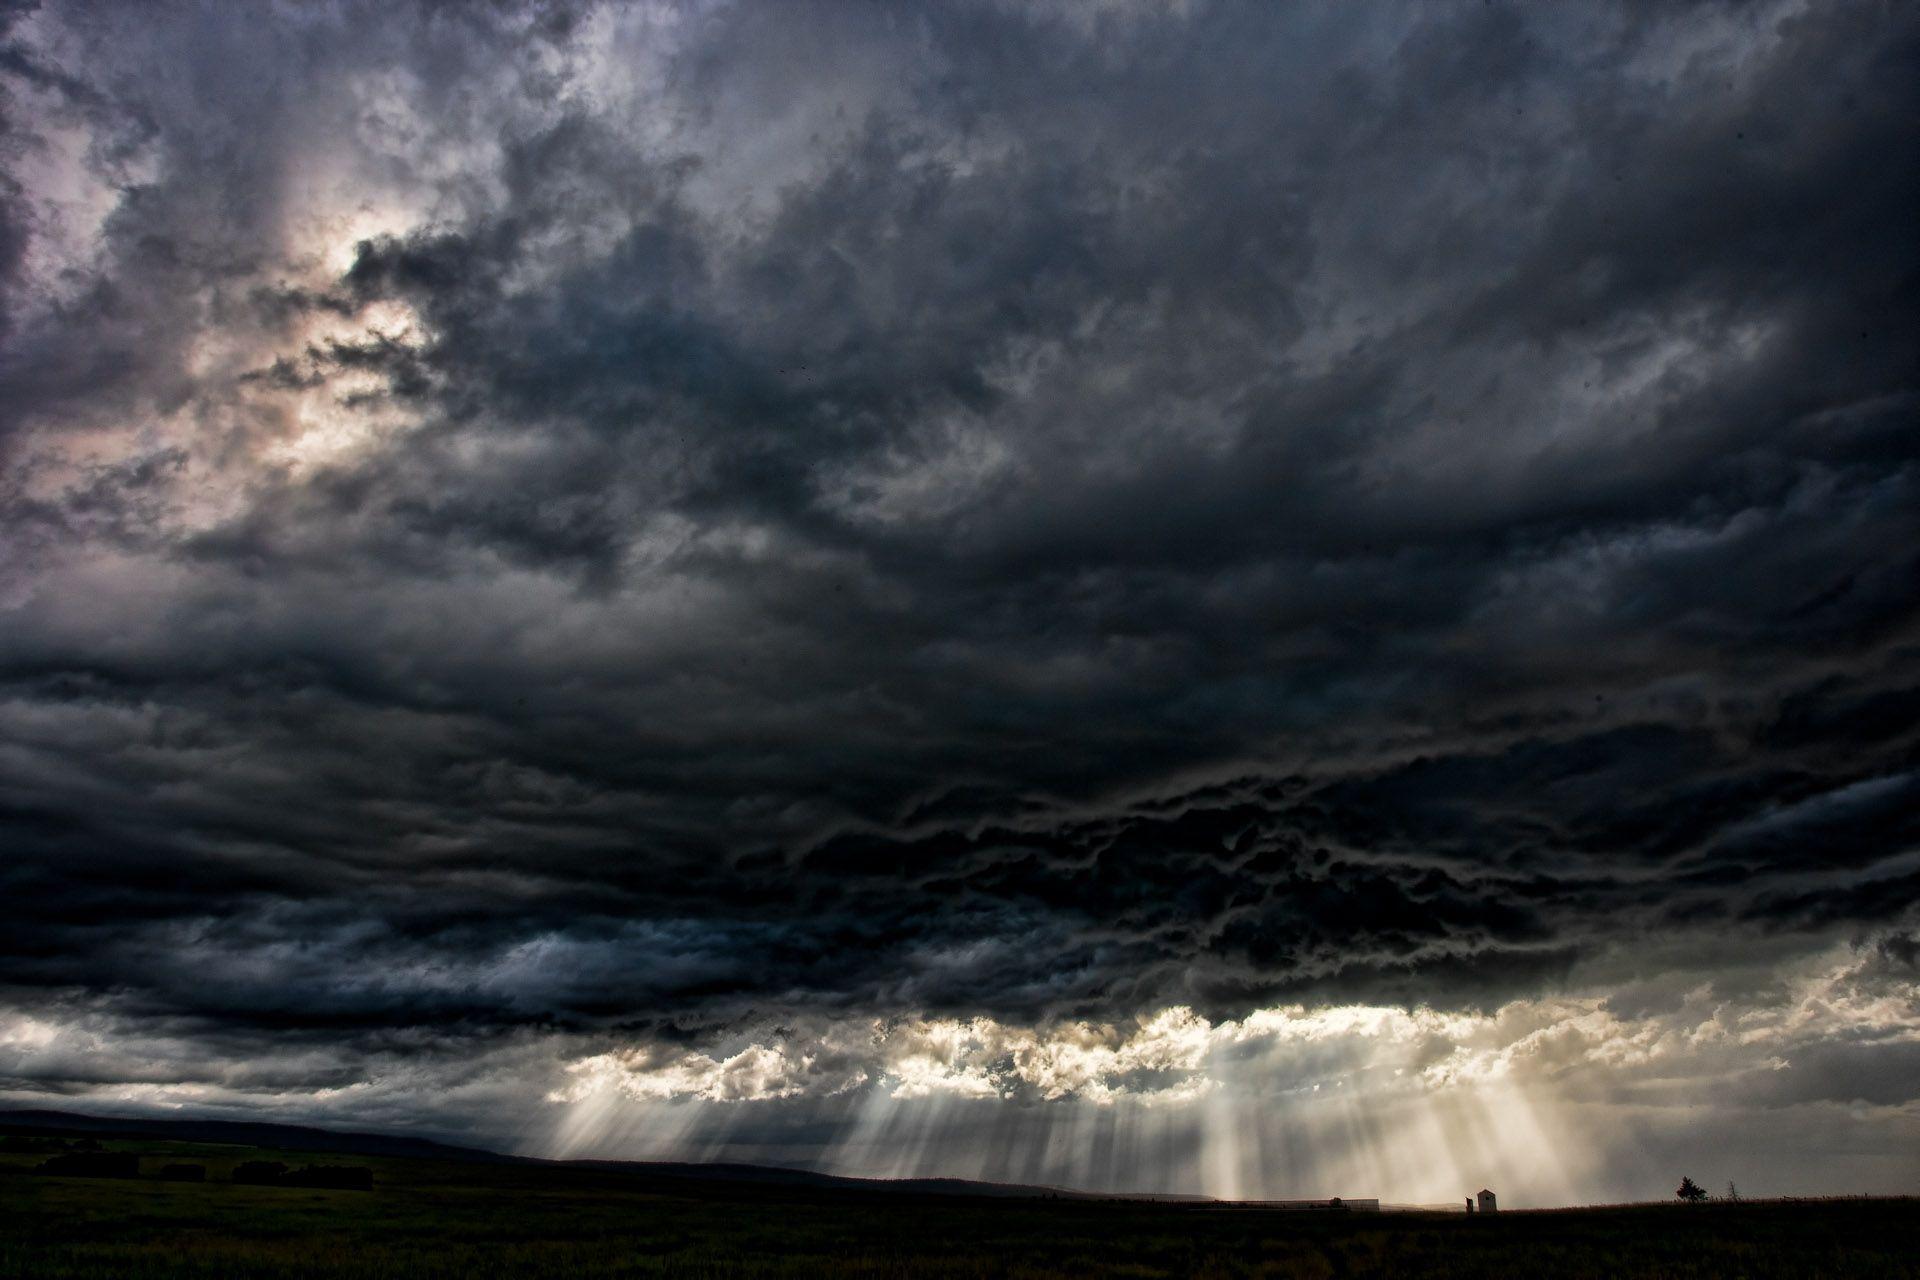 дождевое небо картинки дискомфорт